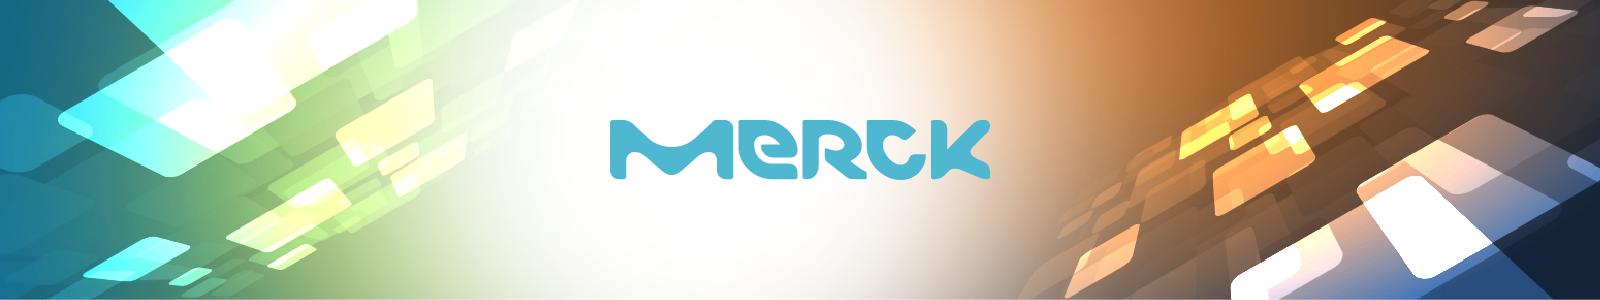 banner-merck